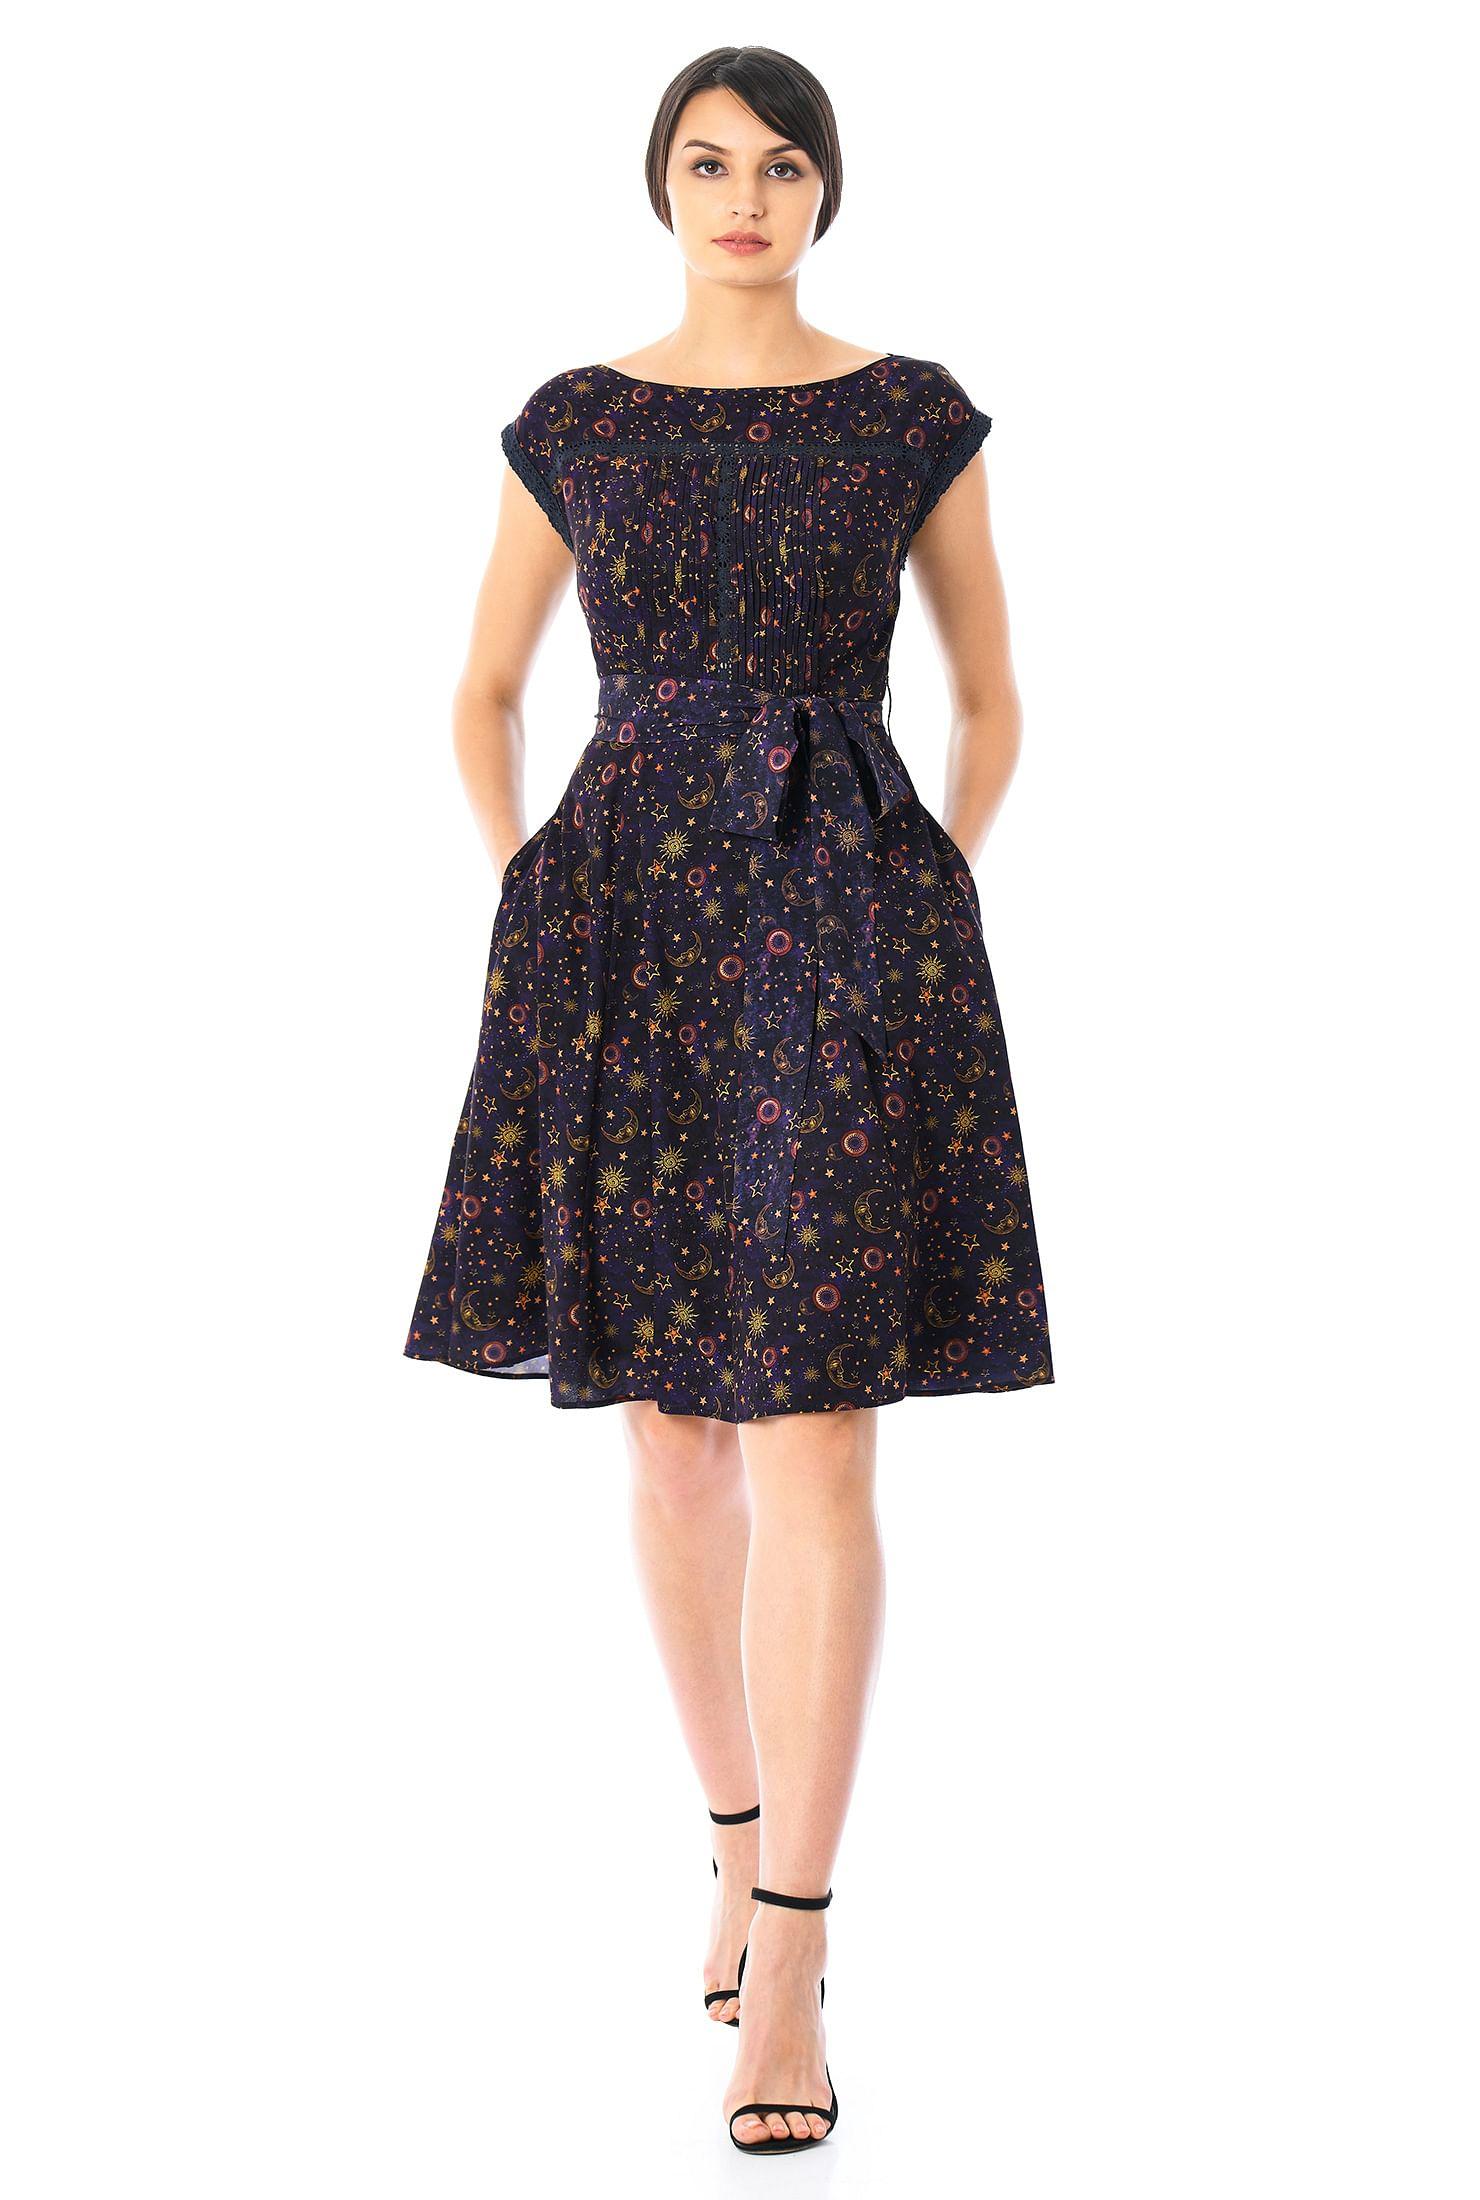 deccd7455b83e0 Women's Fashion Clothing 0-36W and Custom